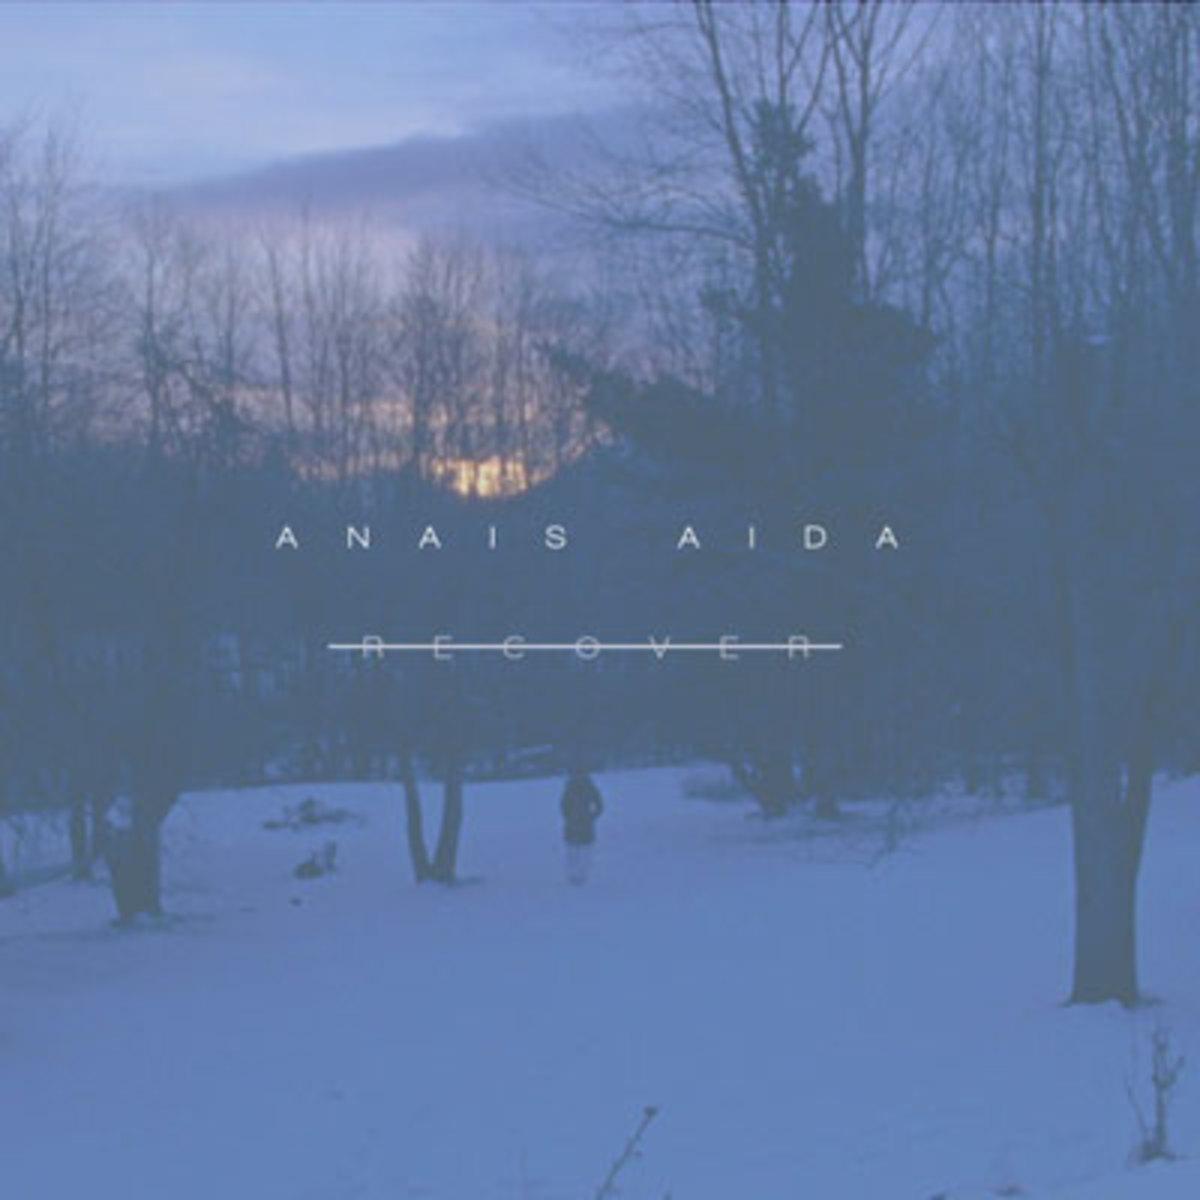 anaisaida-recover.jpg